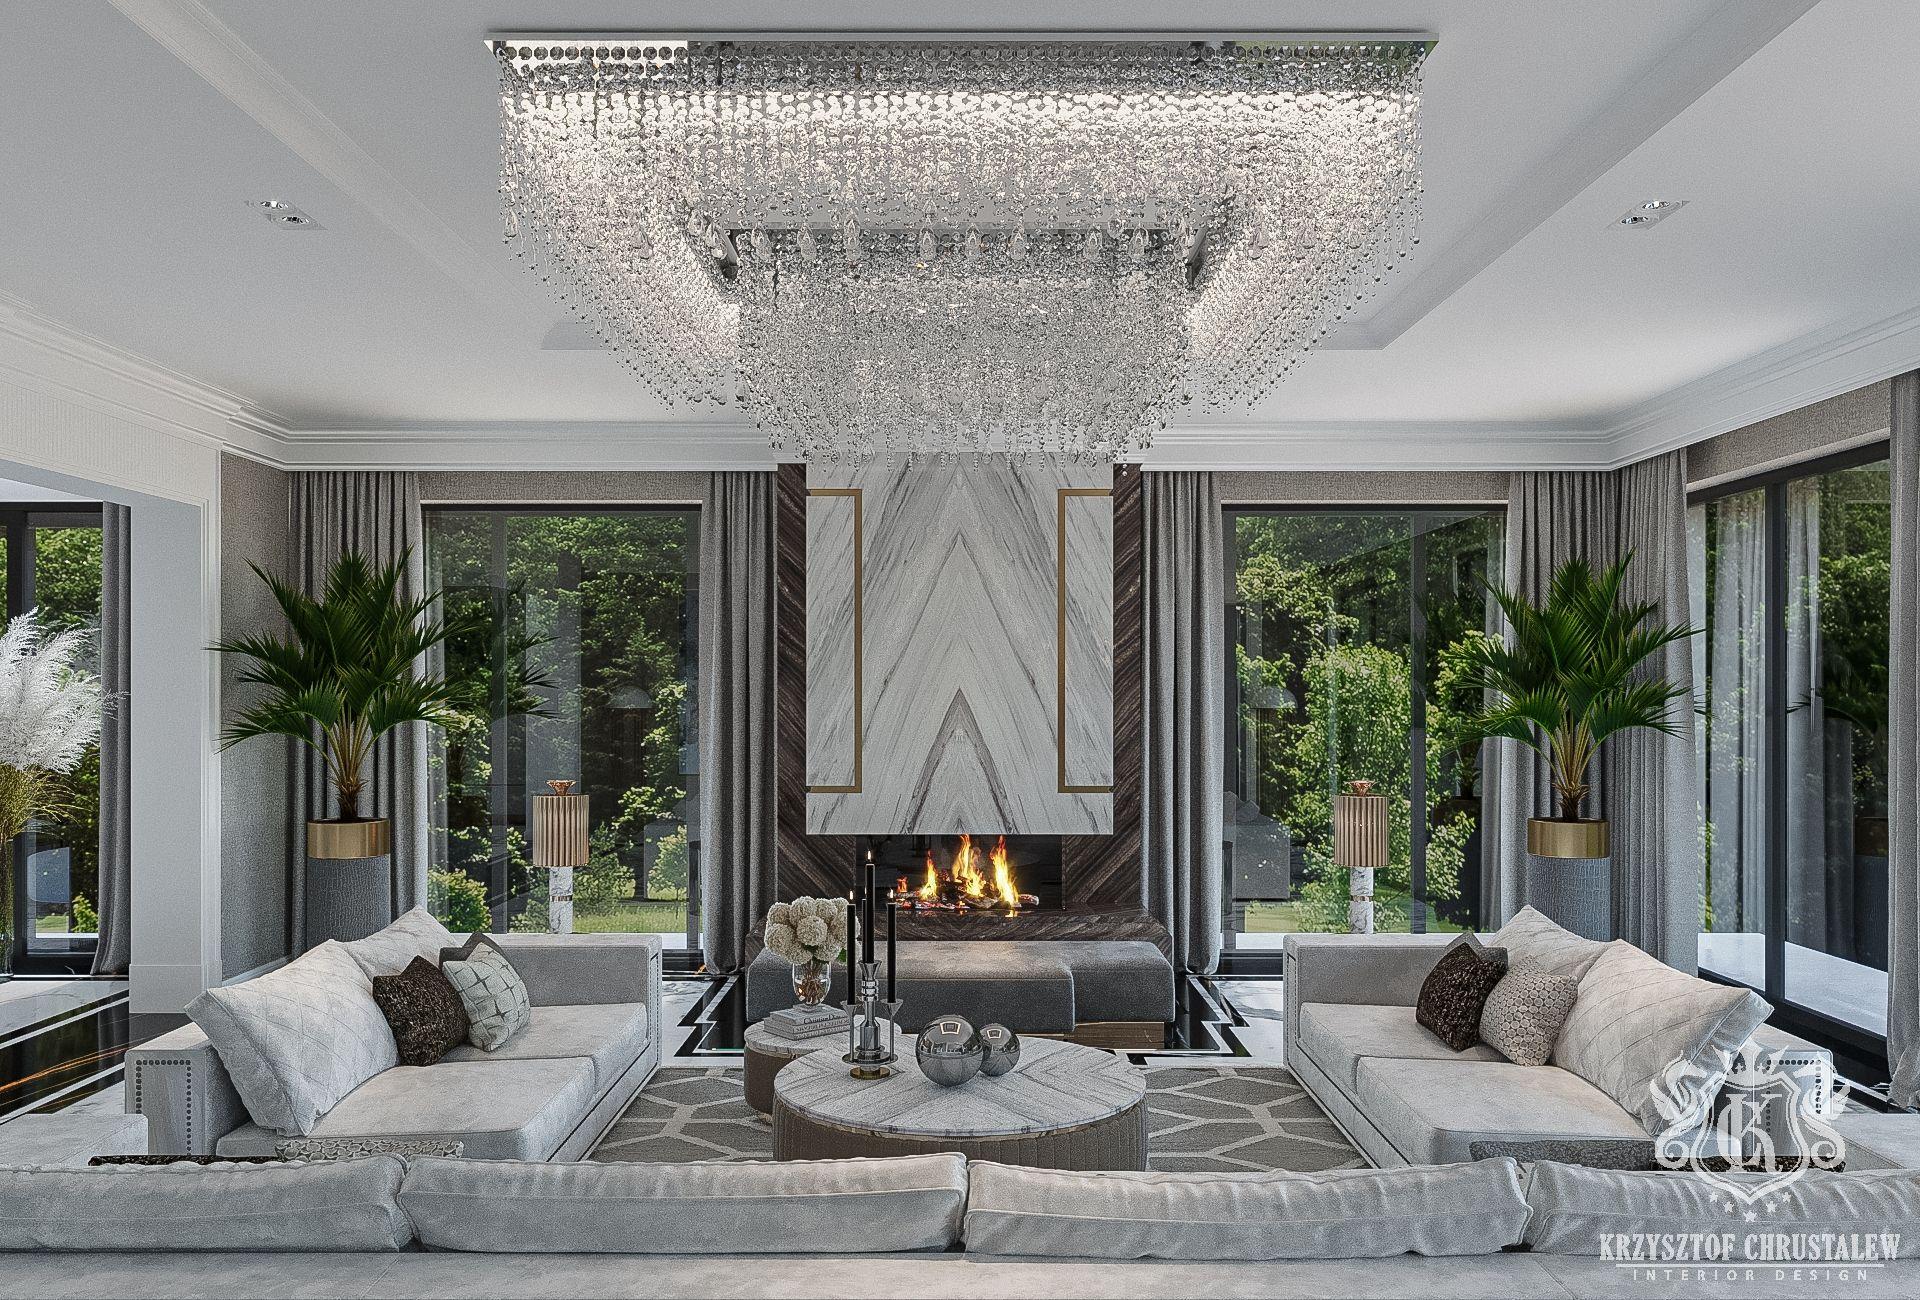 Klasyczne I Glamour Kc Design Luxury Living Room Designs Glamour Luxury Living Room Designs Hotel Lobby Design